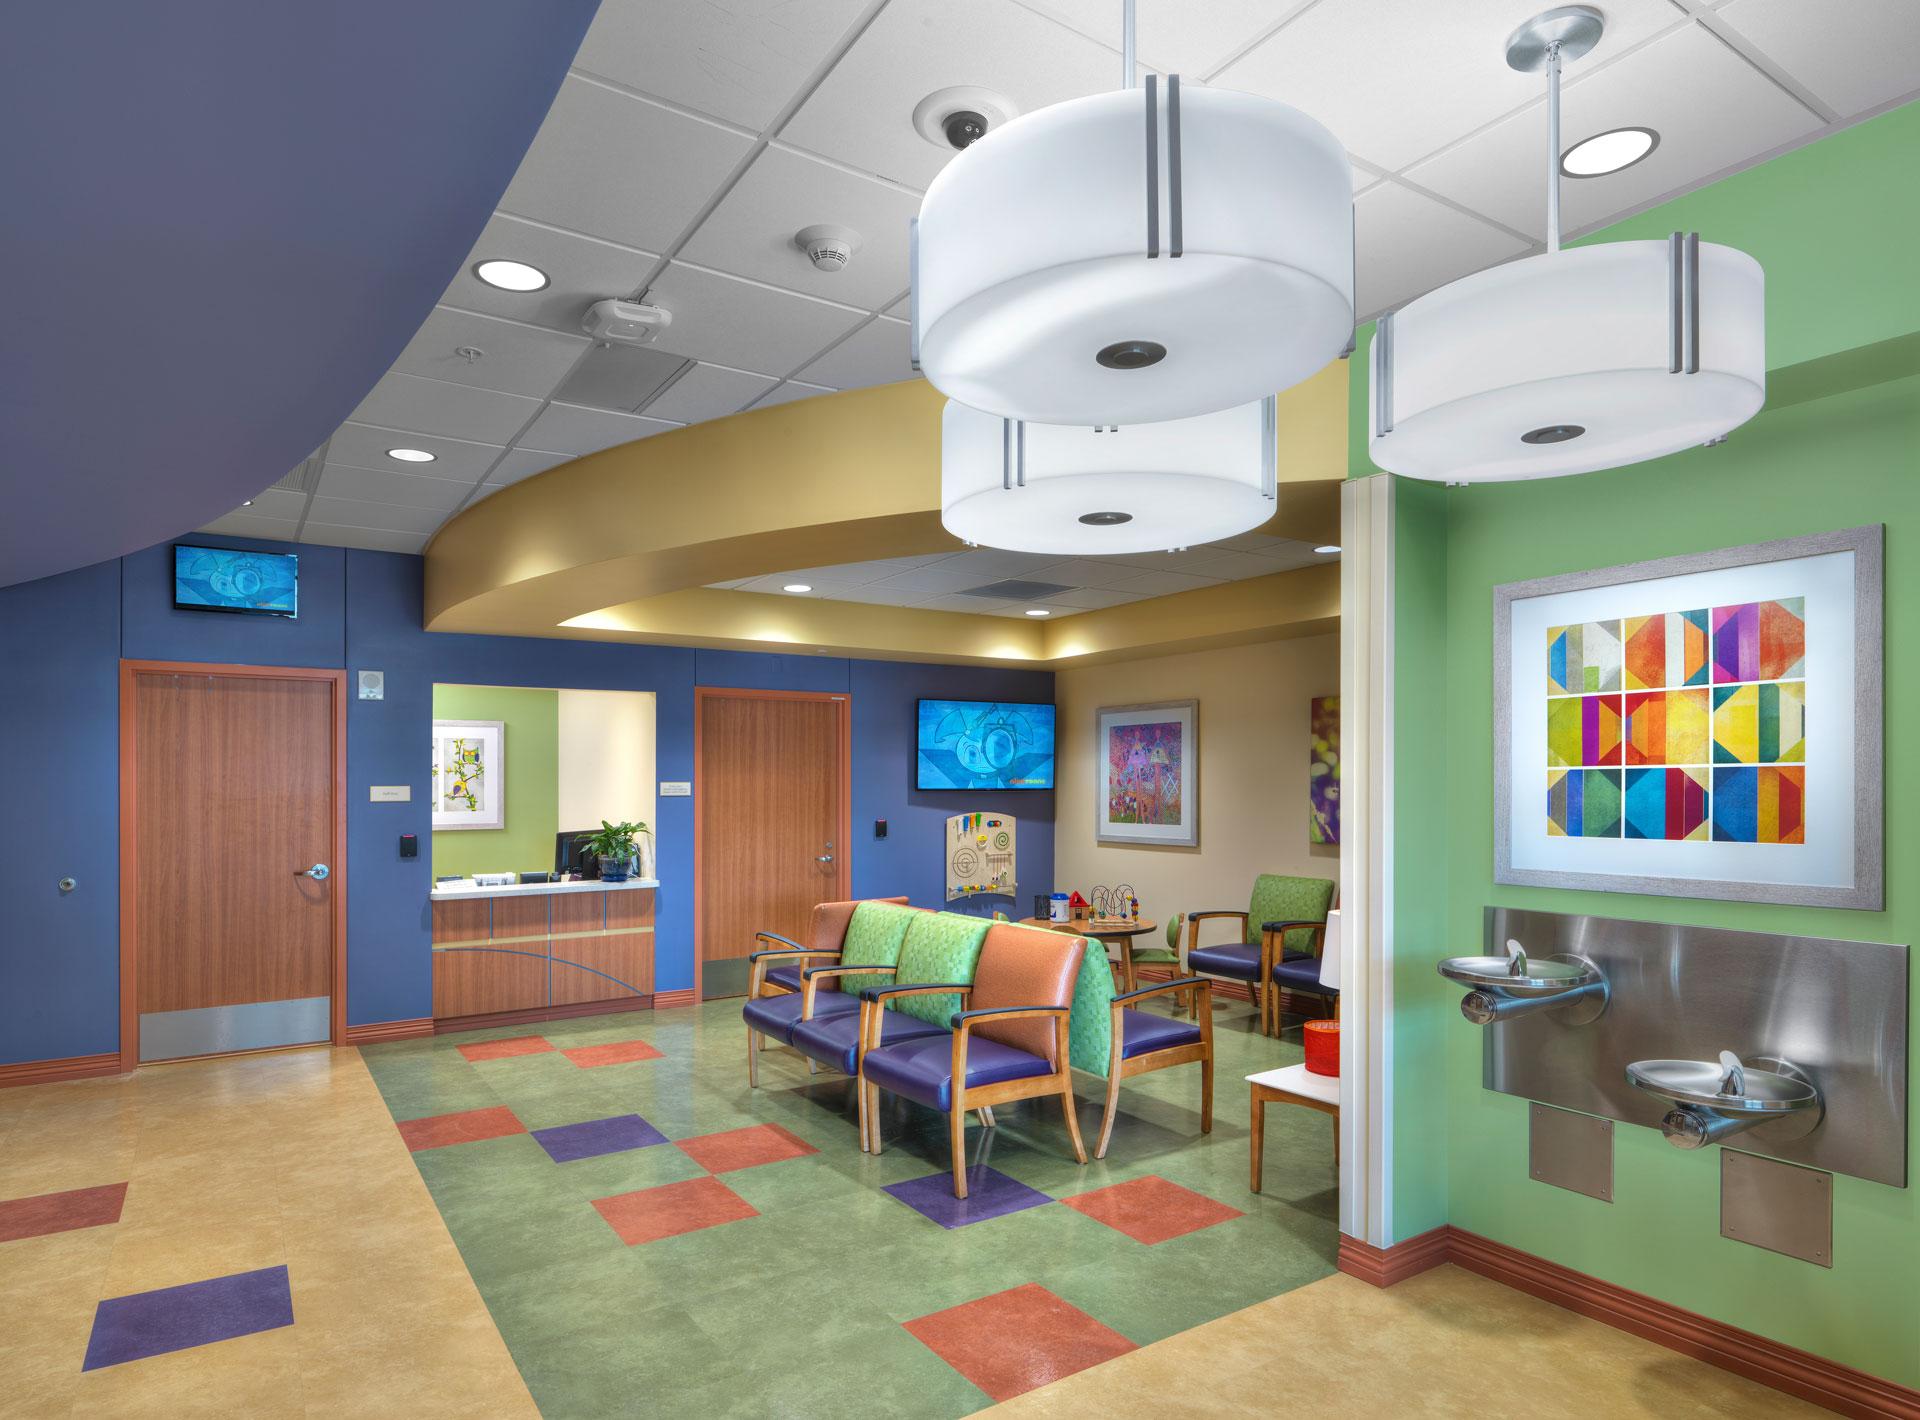 Skyridge Medical Center Pediatric Emergency Department